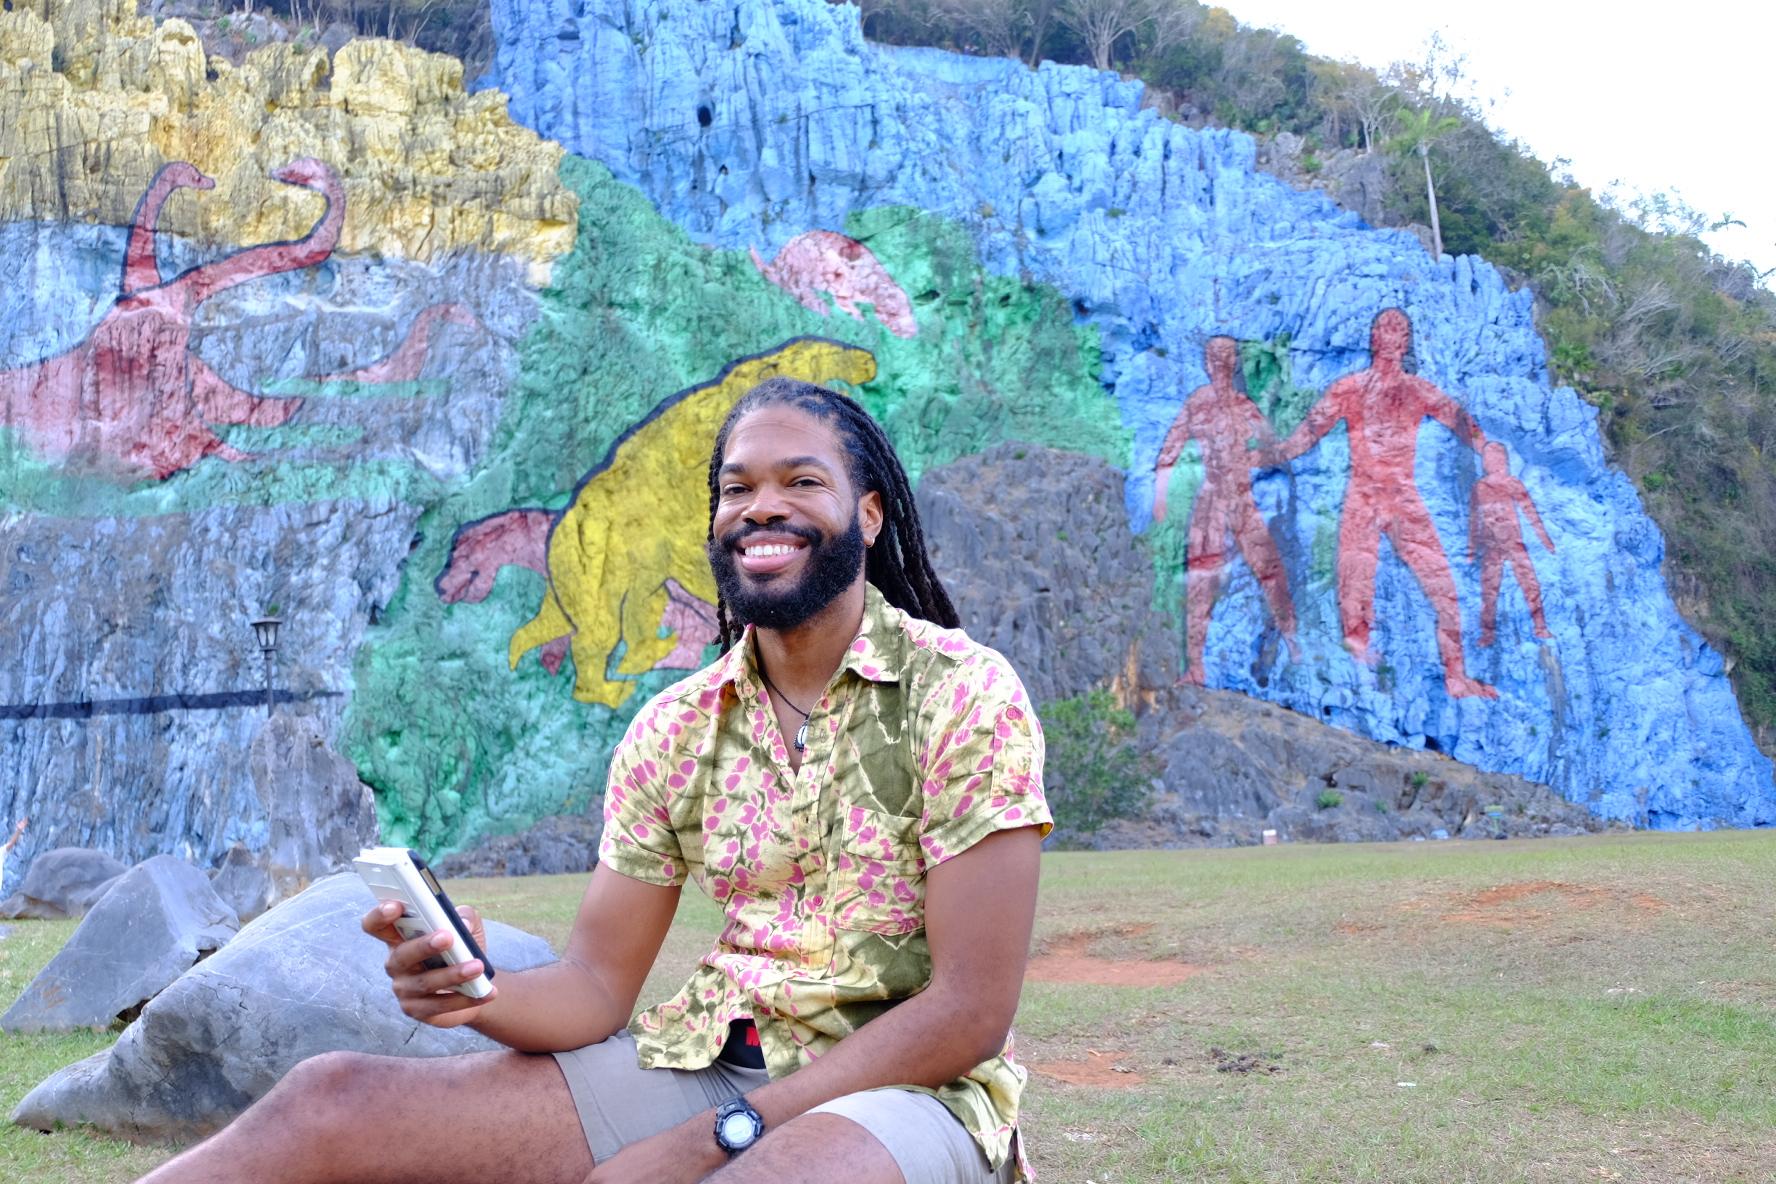 Selfie at Mural de la Prehistoria